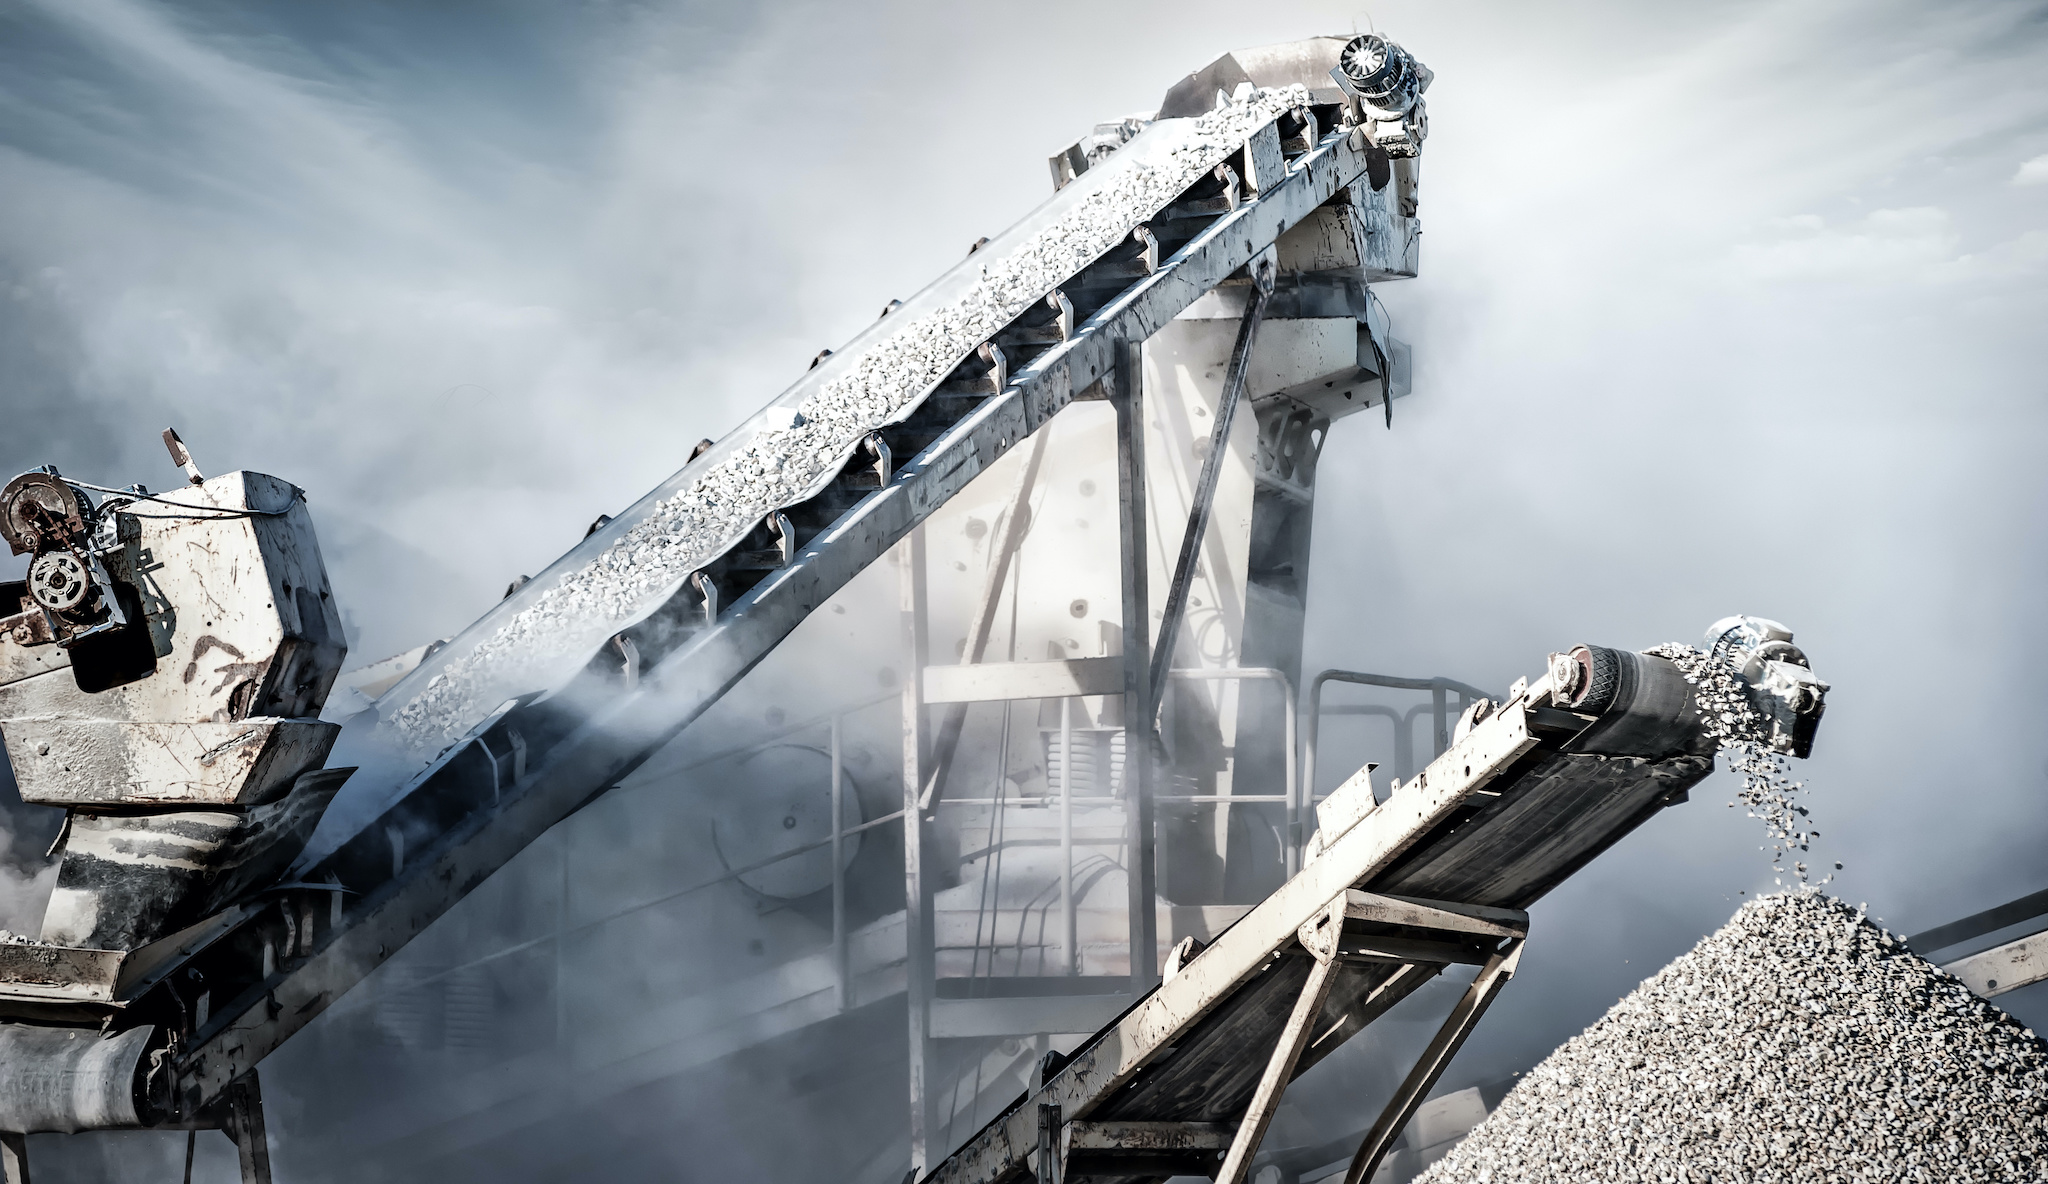 Asphalt & Cement Manufacturing